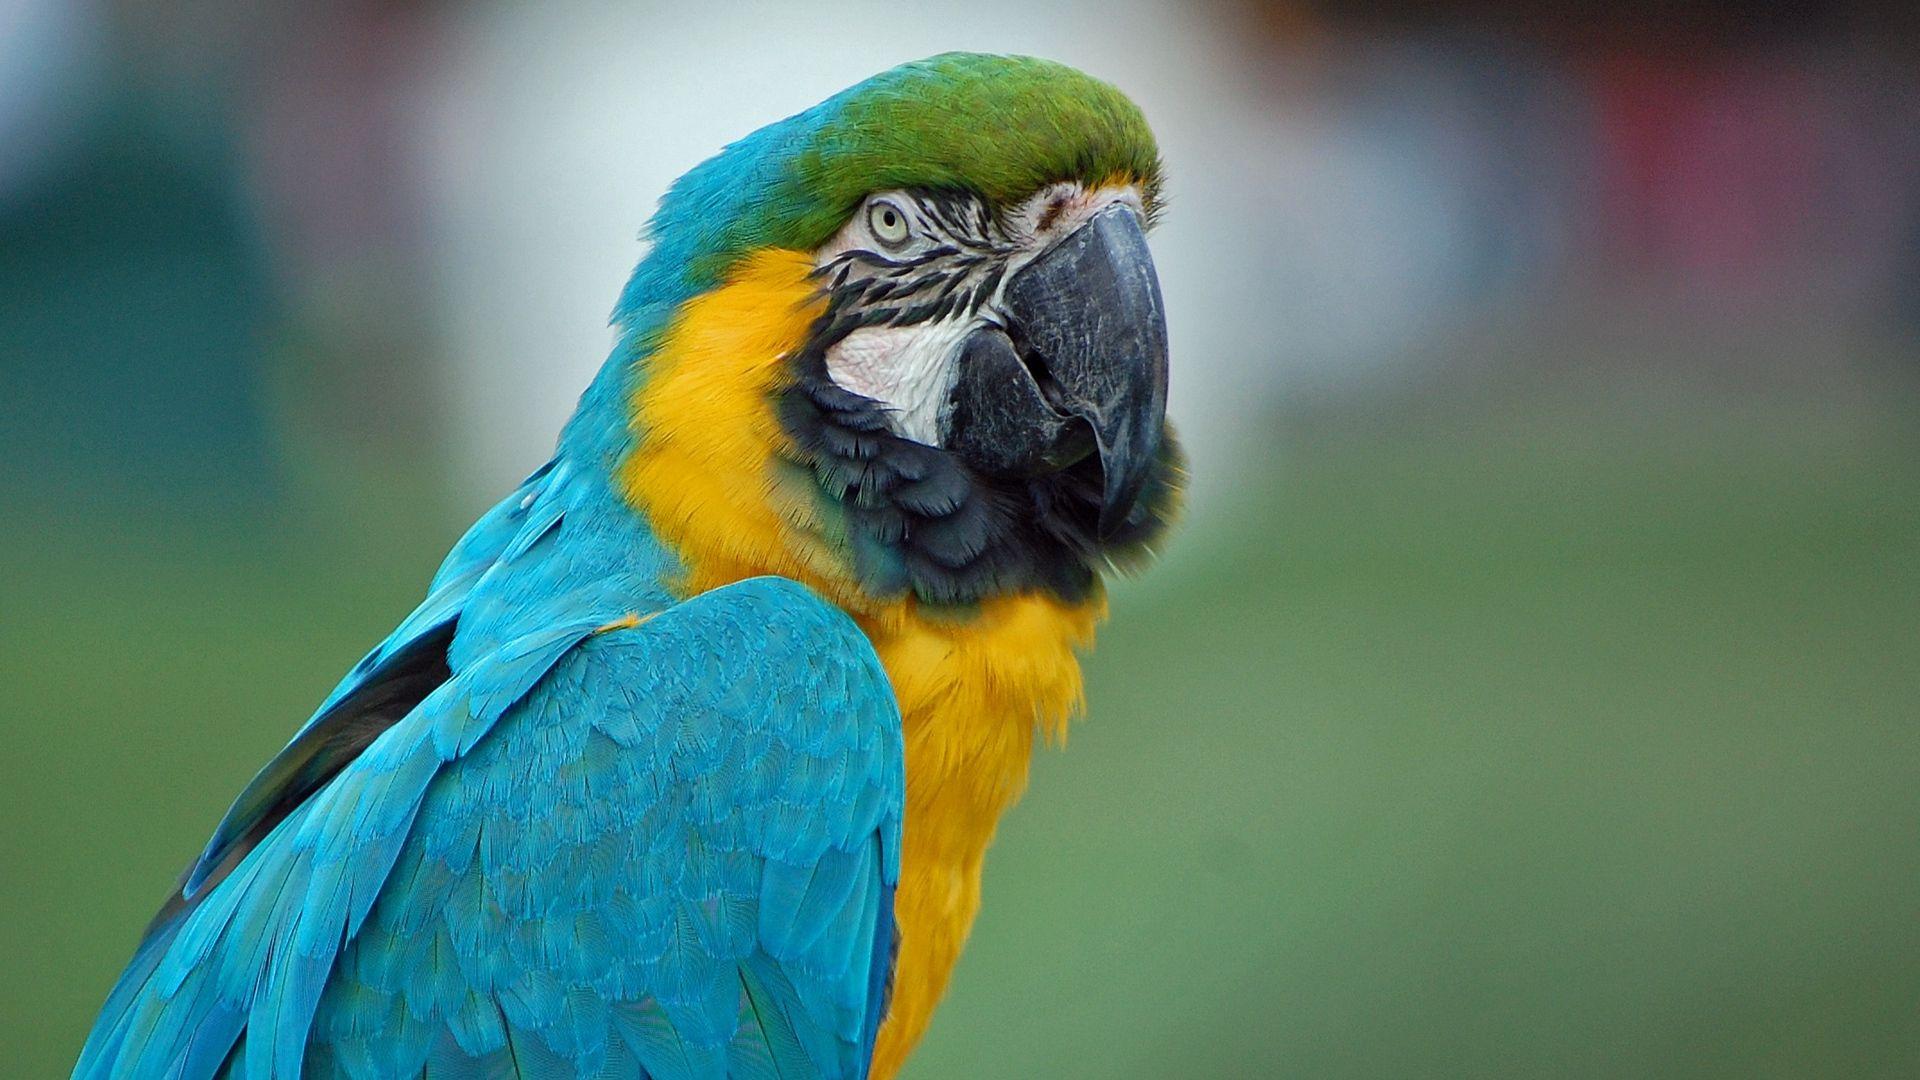 Macaw Parrot Beautiful Photo